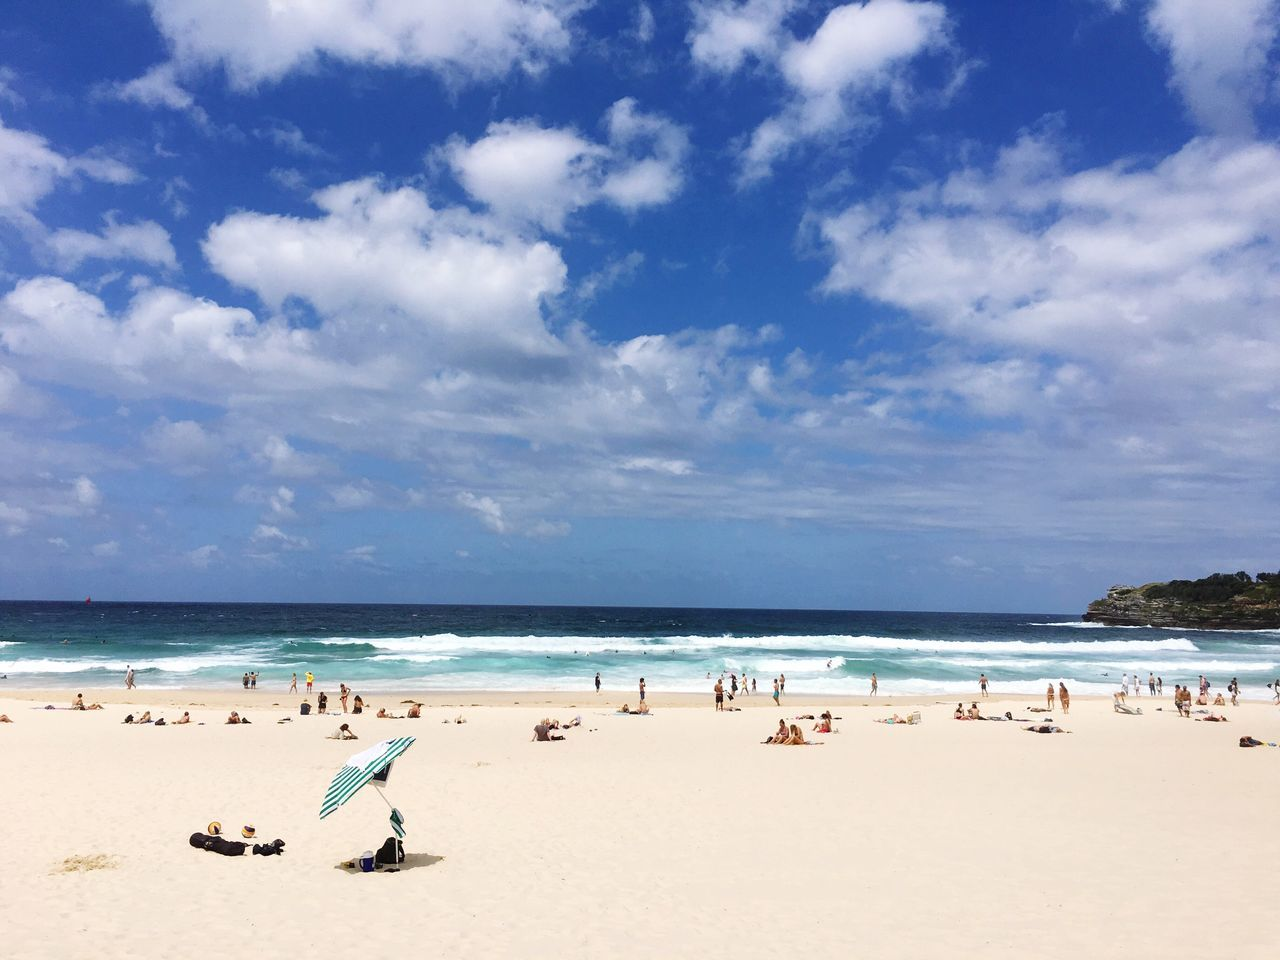 Bondi Beach🏄 Sea Beach Horizon Over Water Sky Water Sand Nature Scenics Beauty In Nature Cloud - Sky Idyllic Outdoors Tranquility Tranquil Scene Day Bondi Bondi Beach Sydney Australia Beachphotography